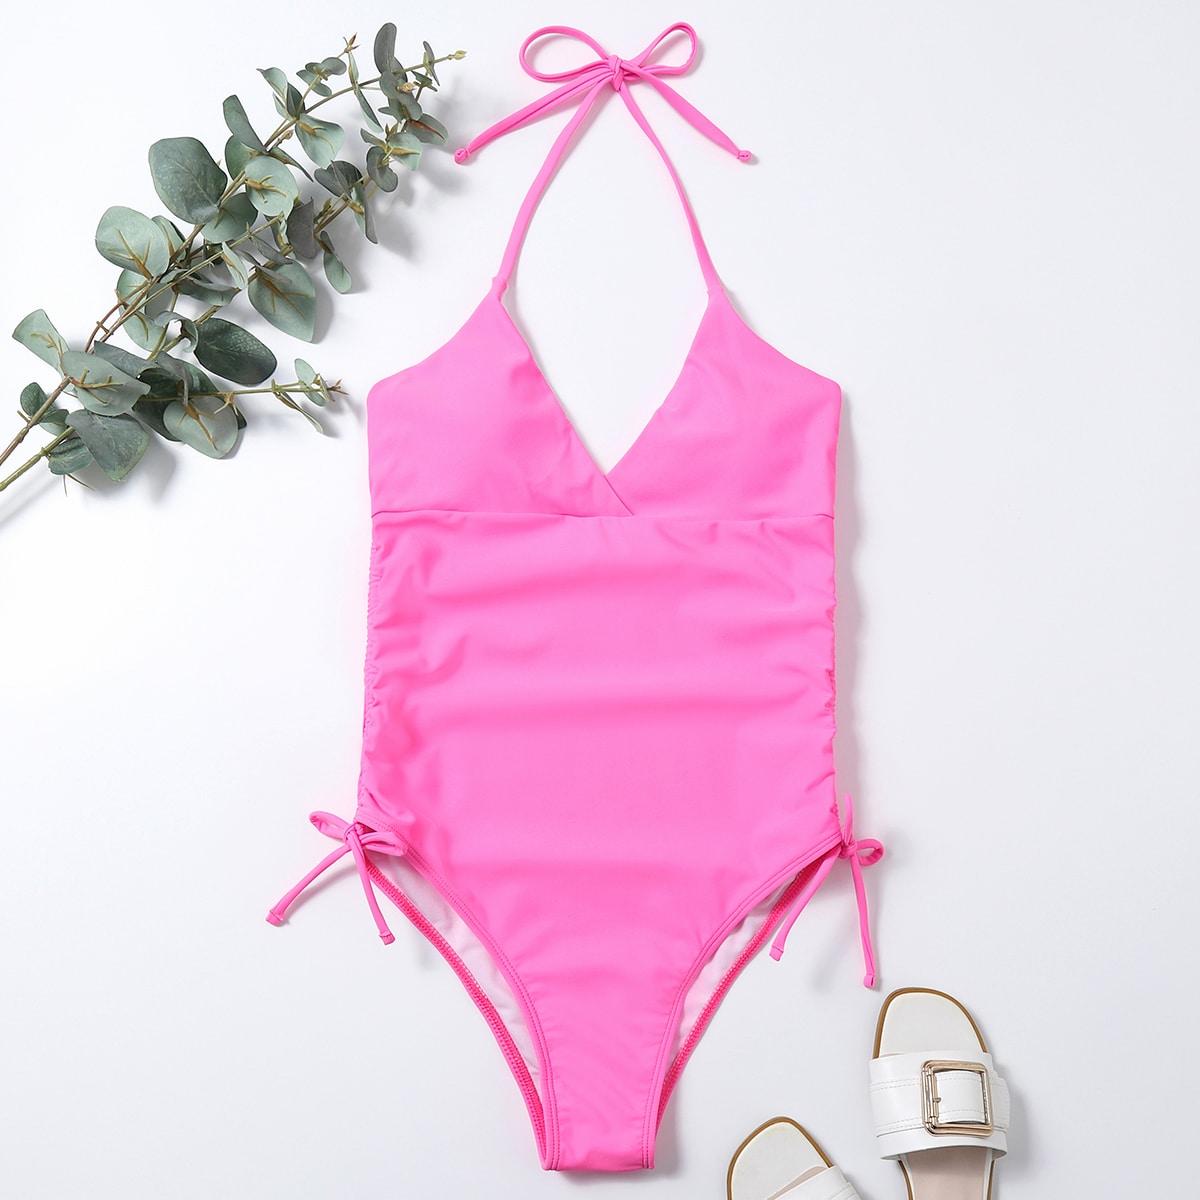 Neon Pink Halter One Piece Swimsuit